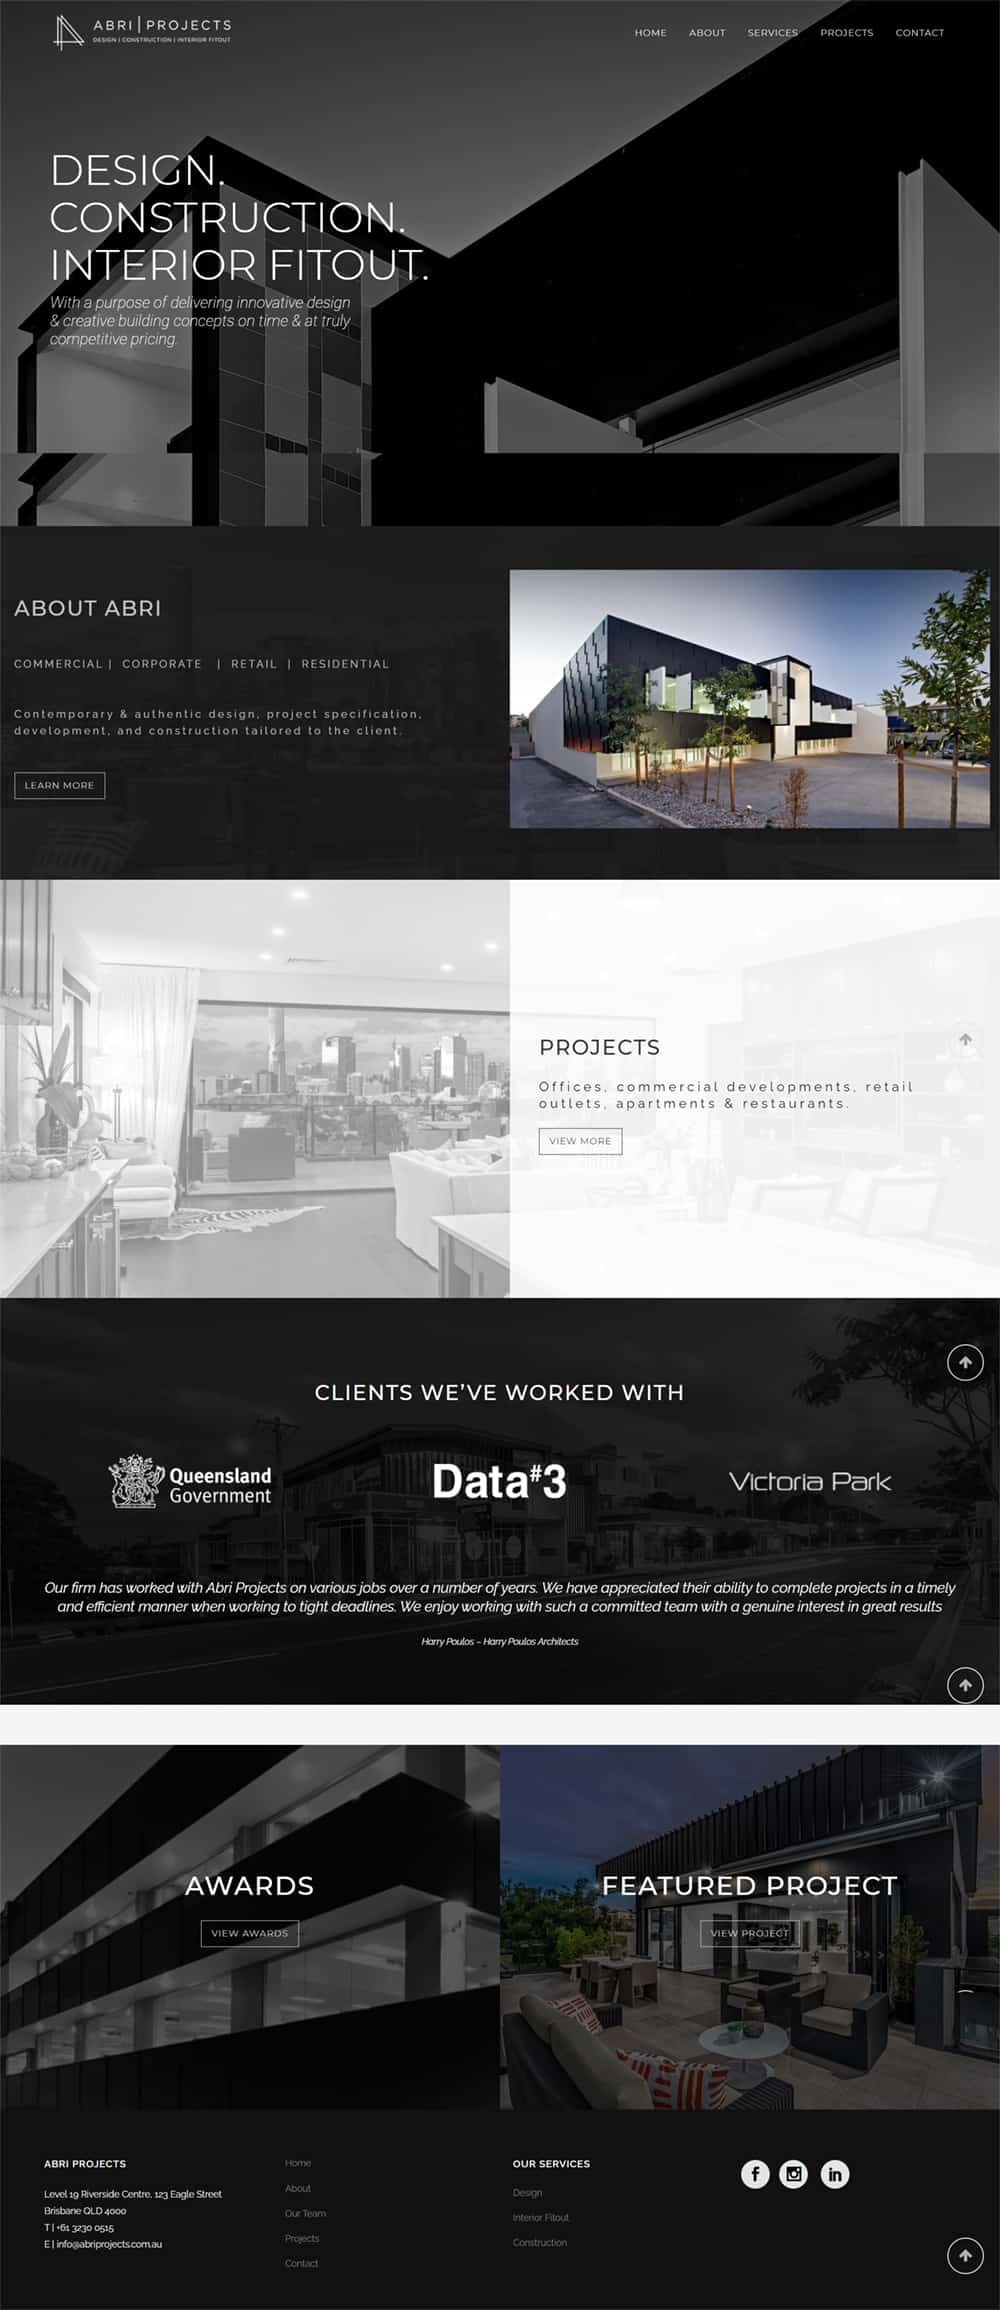 abri website design></noscript><img src='data:image/svg+xml,%3Csvg%20xmlns=%22http://www.w3.org/2000/svg%22%20viewBox=%220%200%20210%20140%22%3E%3C/svg%3E' data-src=